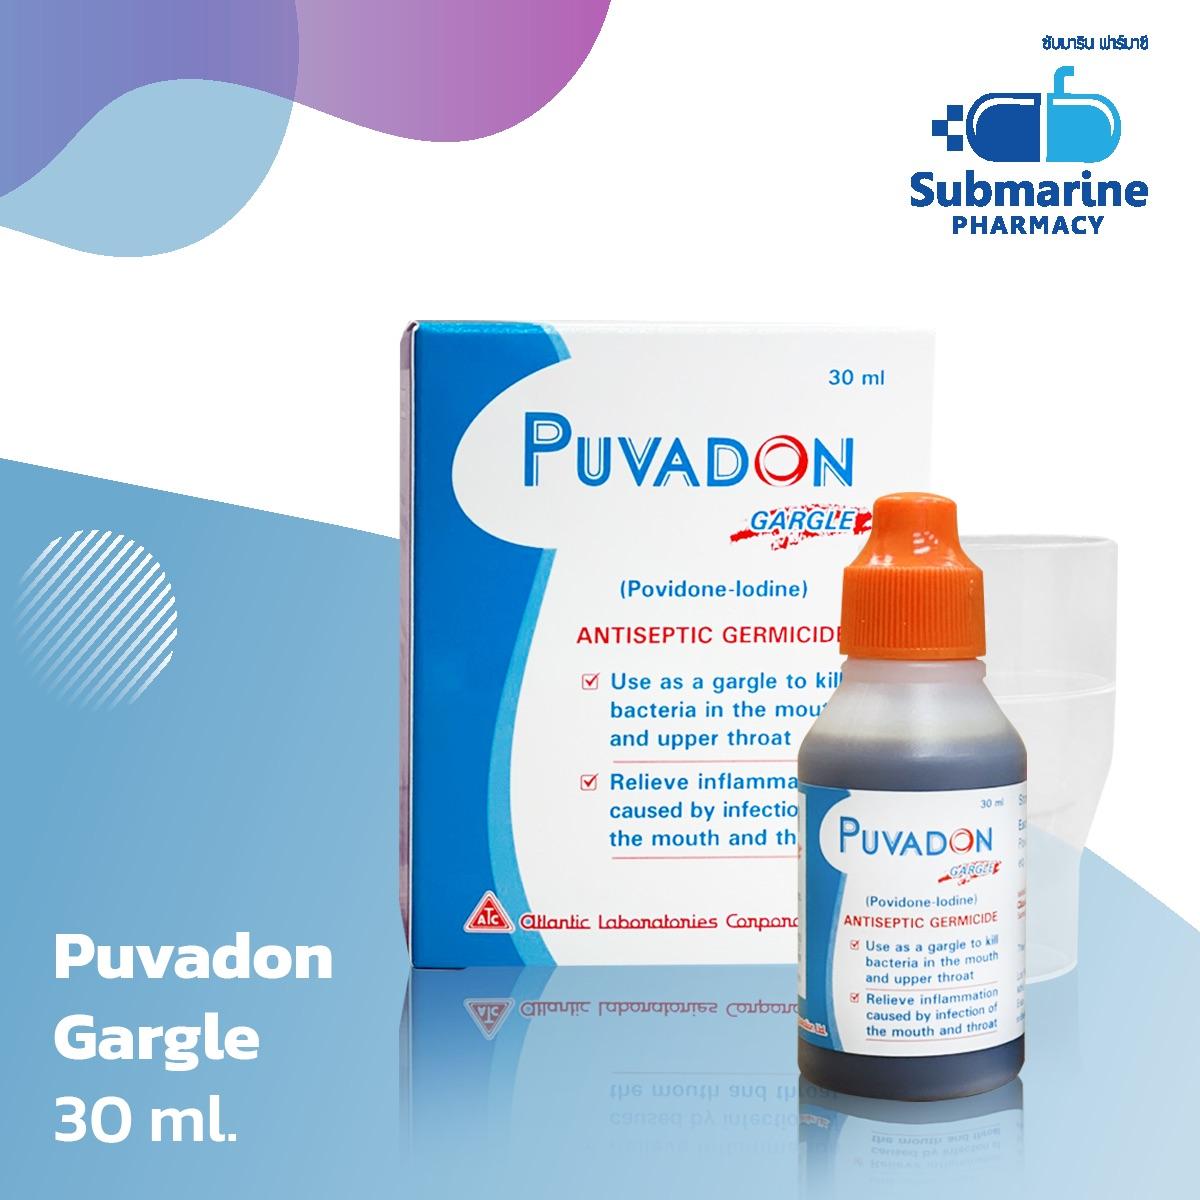 Puvadon 30 Ml น้ำยากลั้วคอ สูตรเดียวกับ Betadine Gargle/submarine Pharmacy.